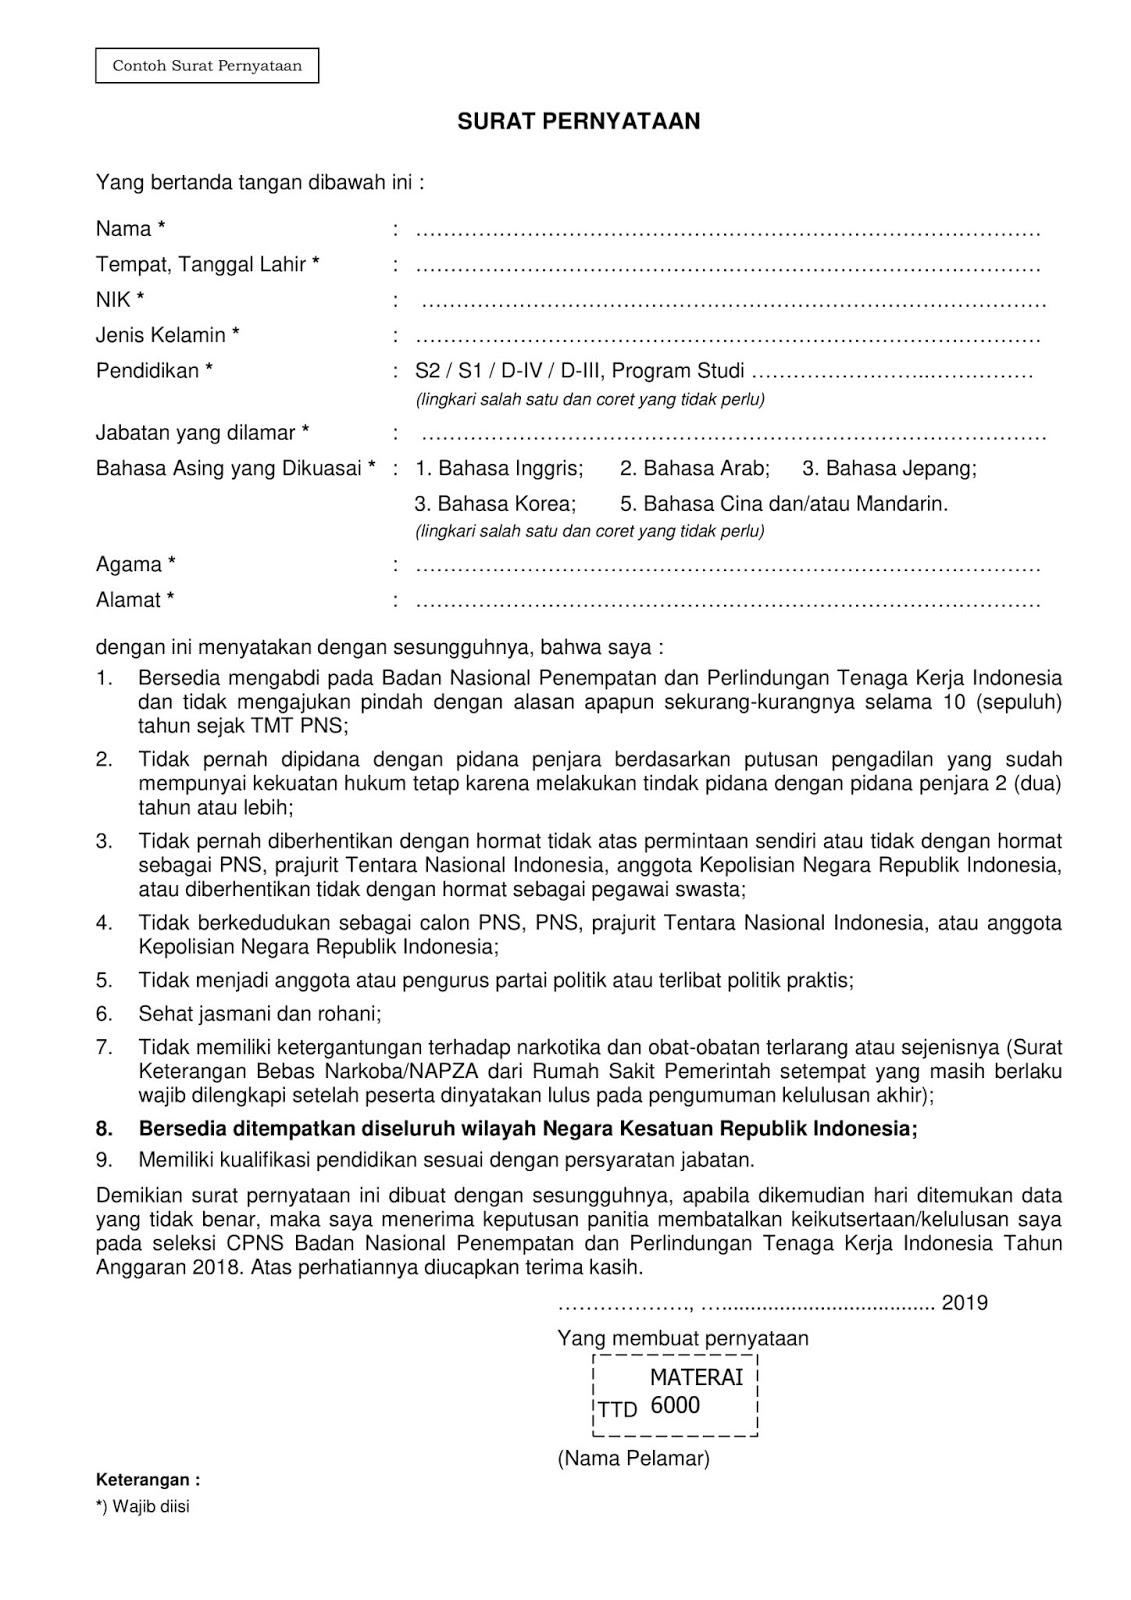 Surat Pernyataan Seleksi CPNS BNP2TKI TA 2019